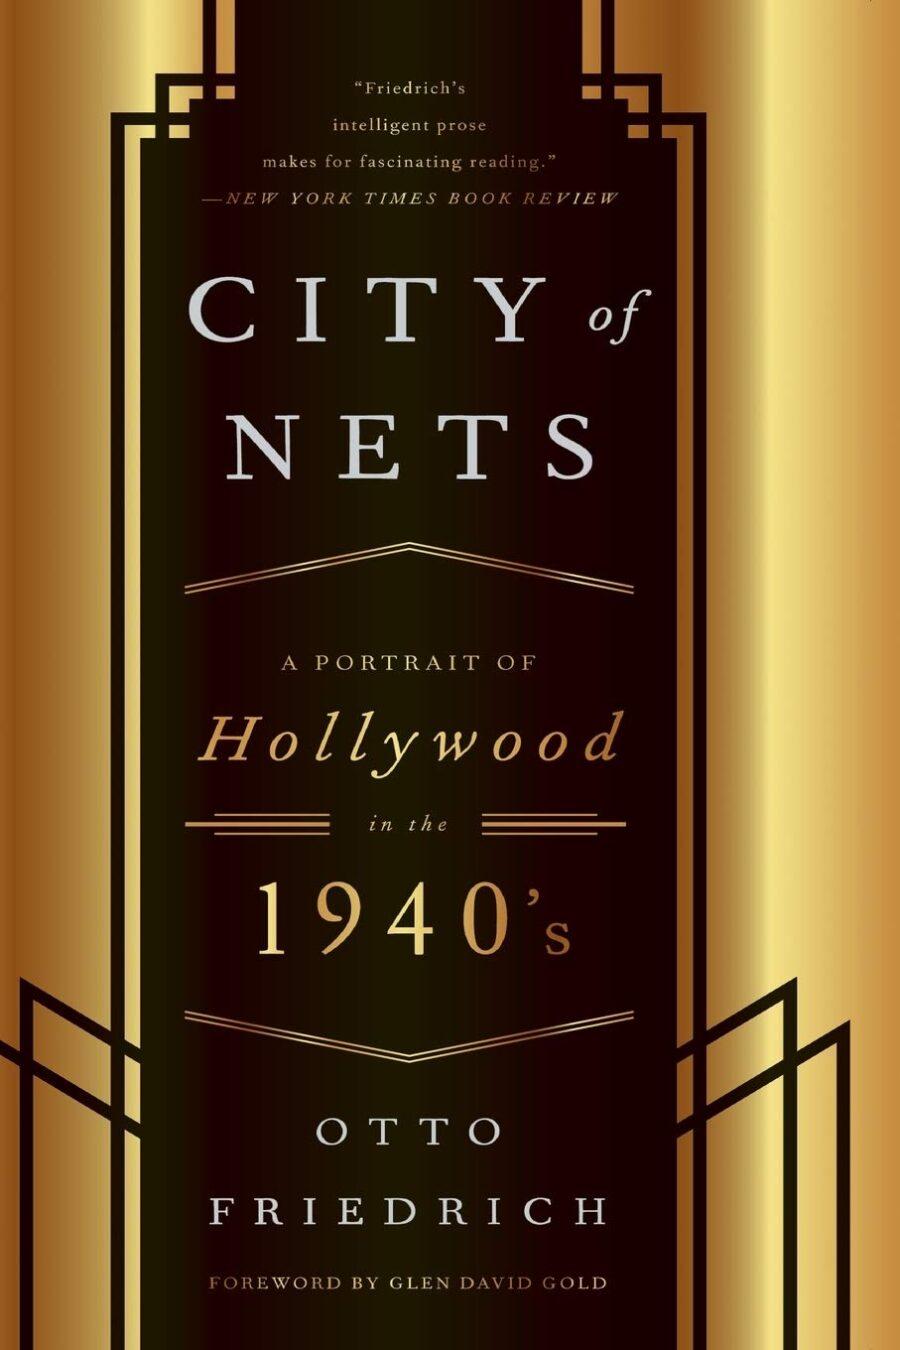 9780062326041-city-of-nets